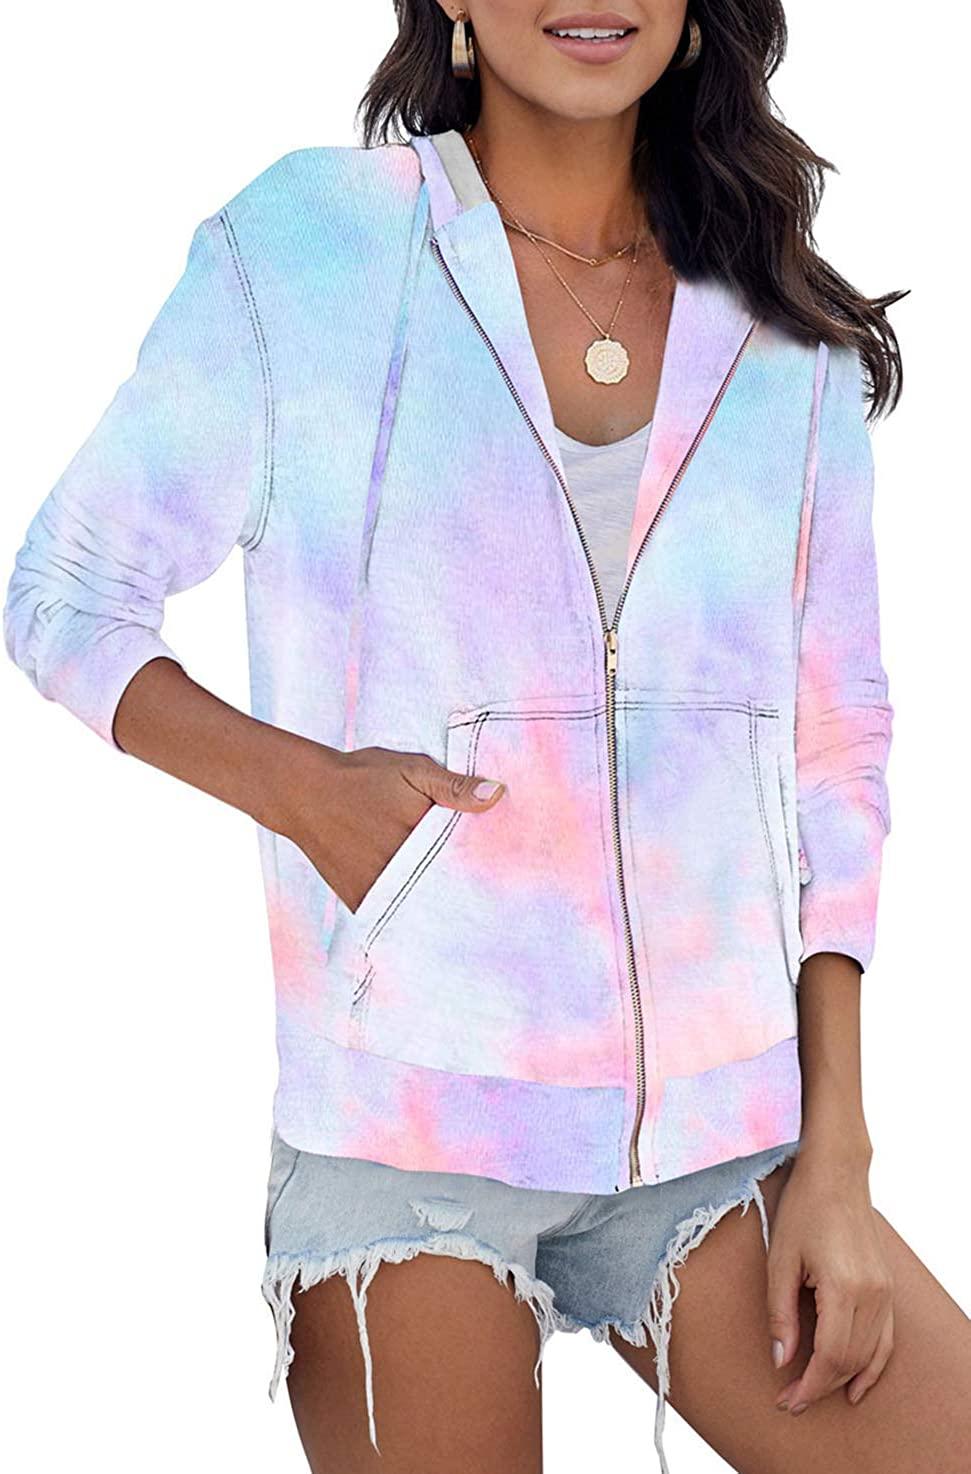 Women's Long Sleeve Tie Dye Hoodie Full Zip Up Cotton Casual Fit Sweatshirt with Pockets